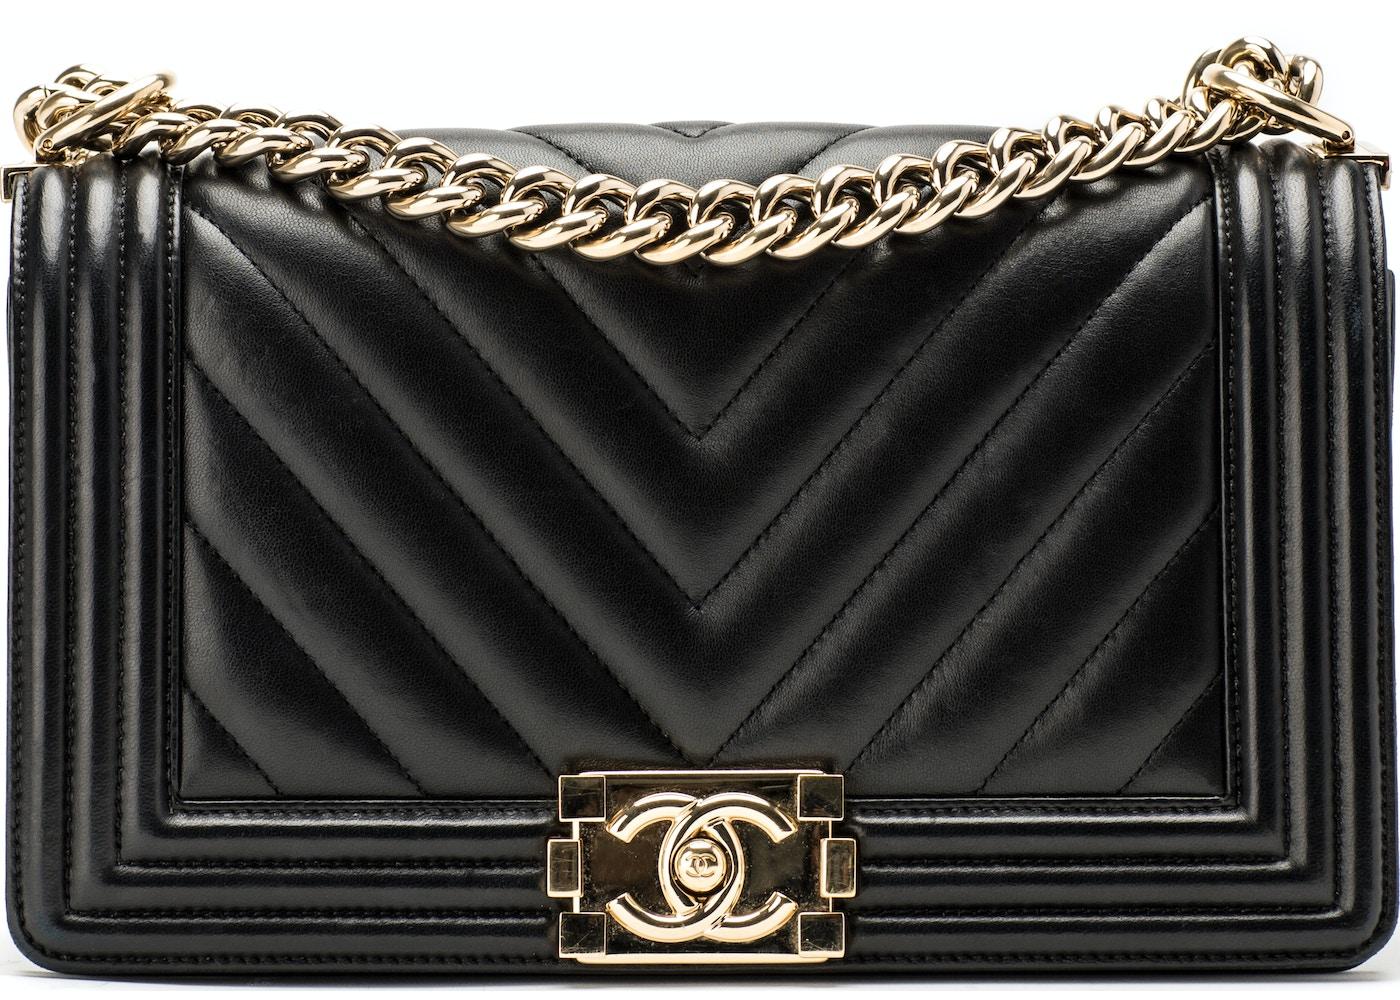 4f725afc7ba999 Chanel Boy Chevron Medium Flap Bag Price | Stanford Center for ...